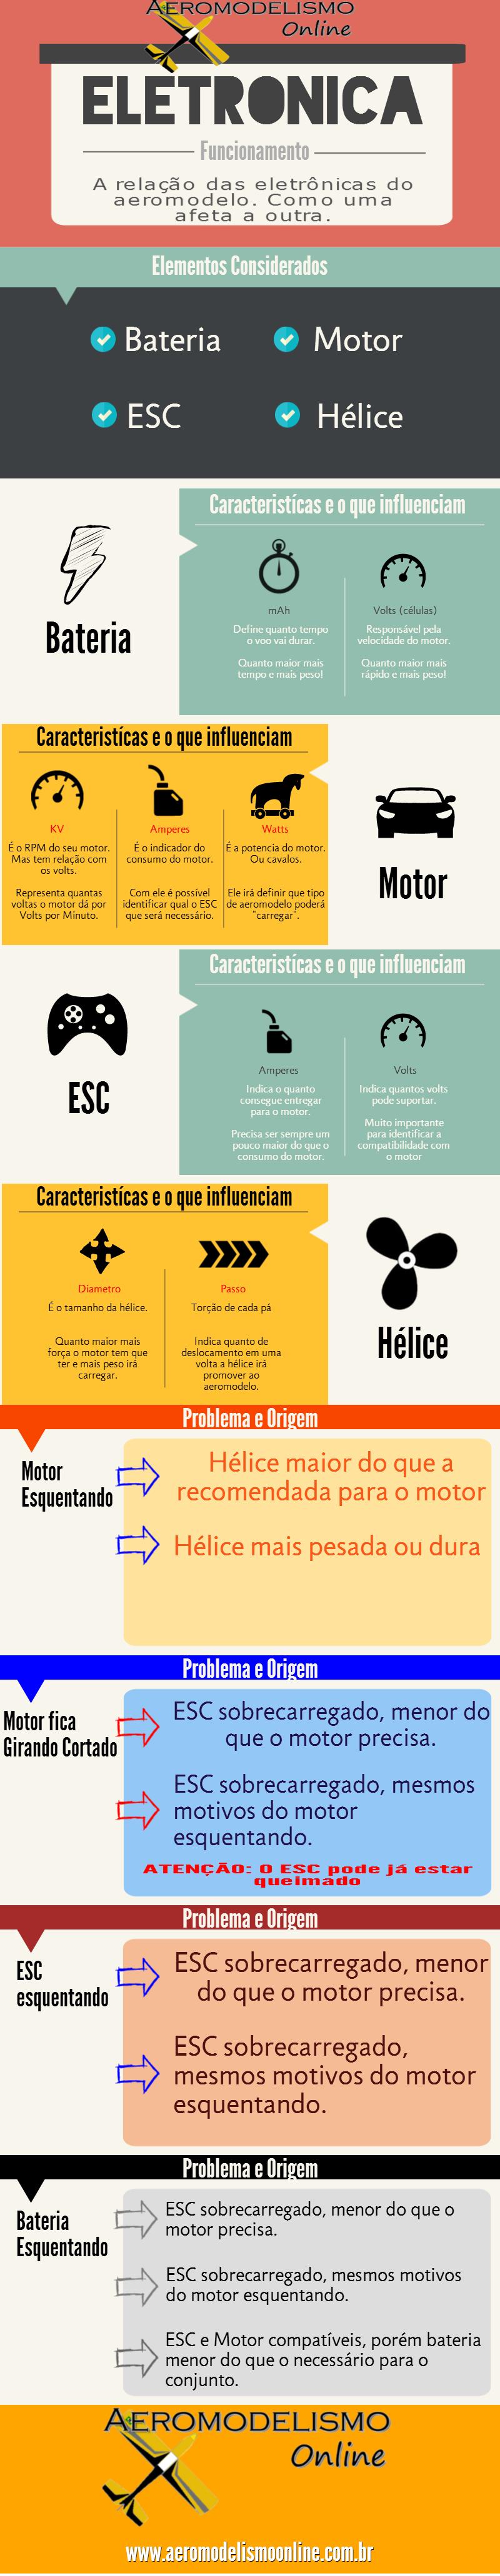 Eletronicos-Aeromodelo